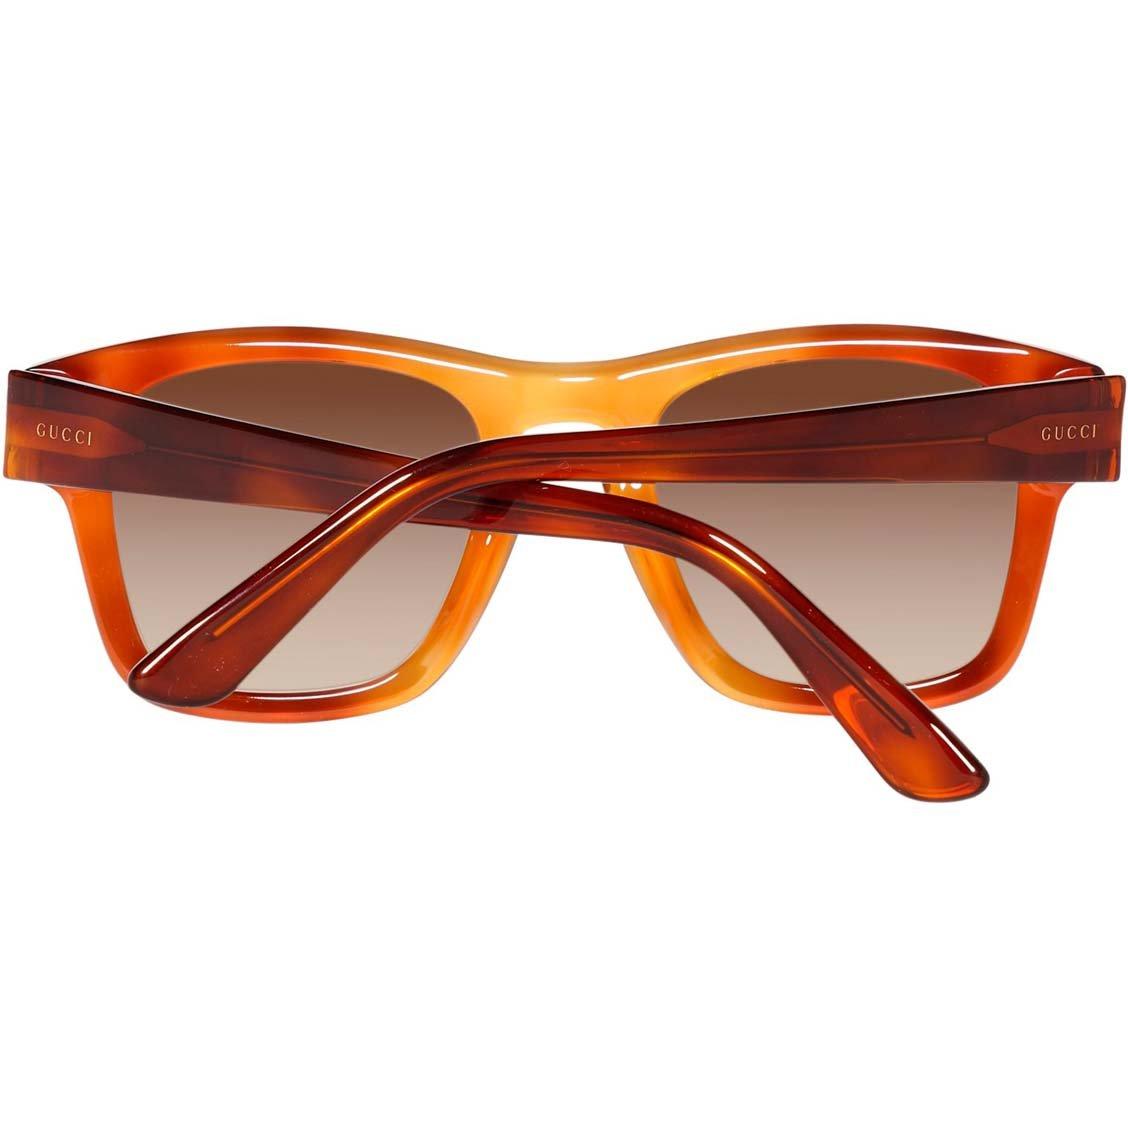 973e29ca261 Amazon.com  Gucci GG 3791 S OHNJD (Light Havana with Brown Gradient  lenses)  Clothing